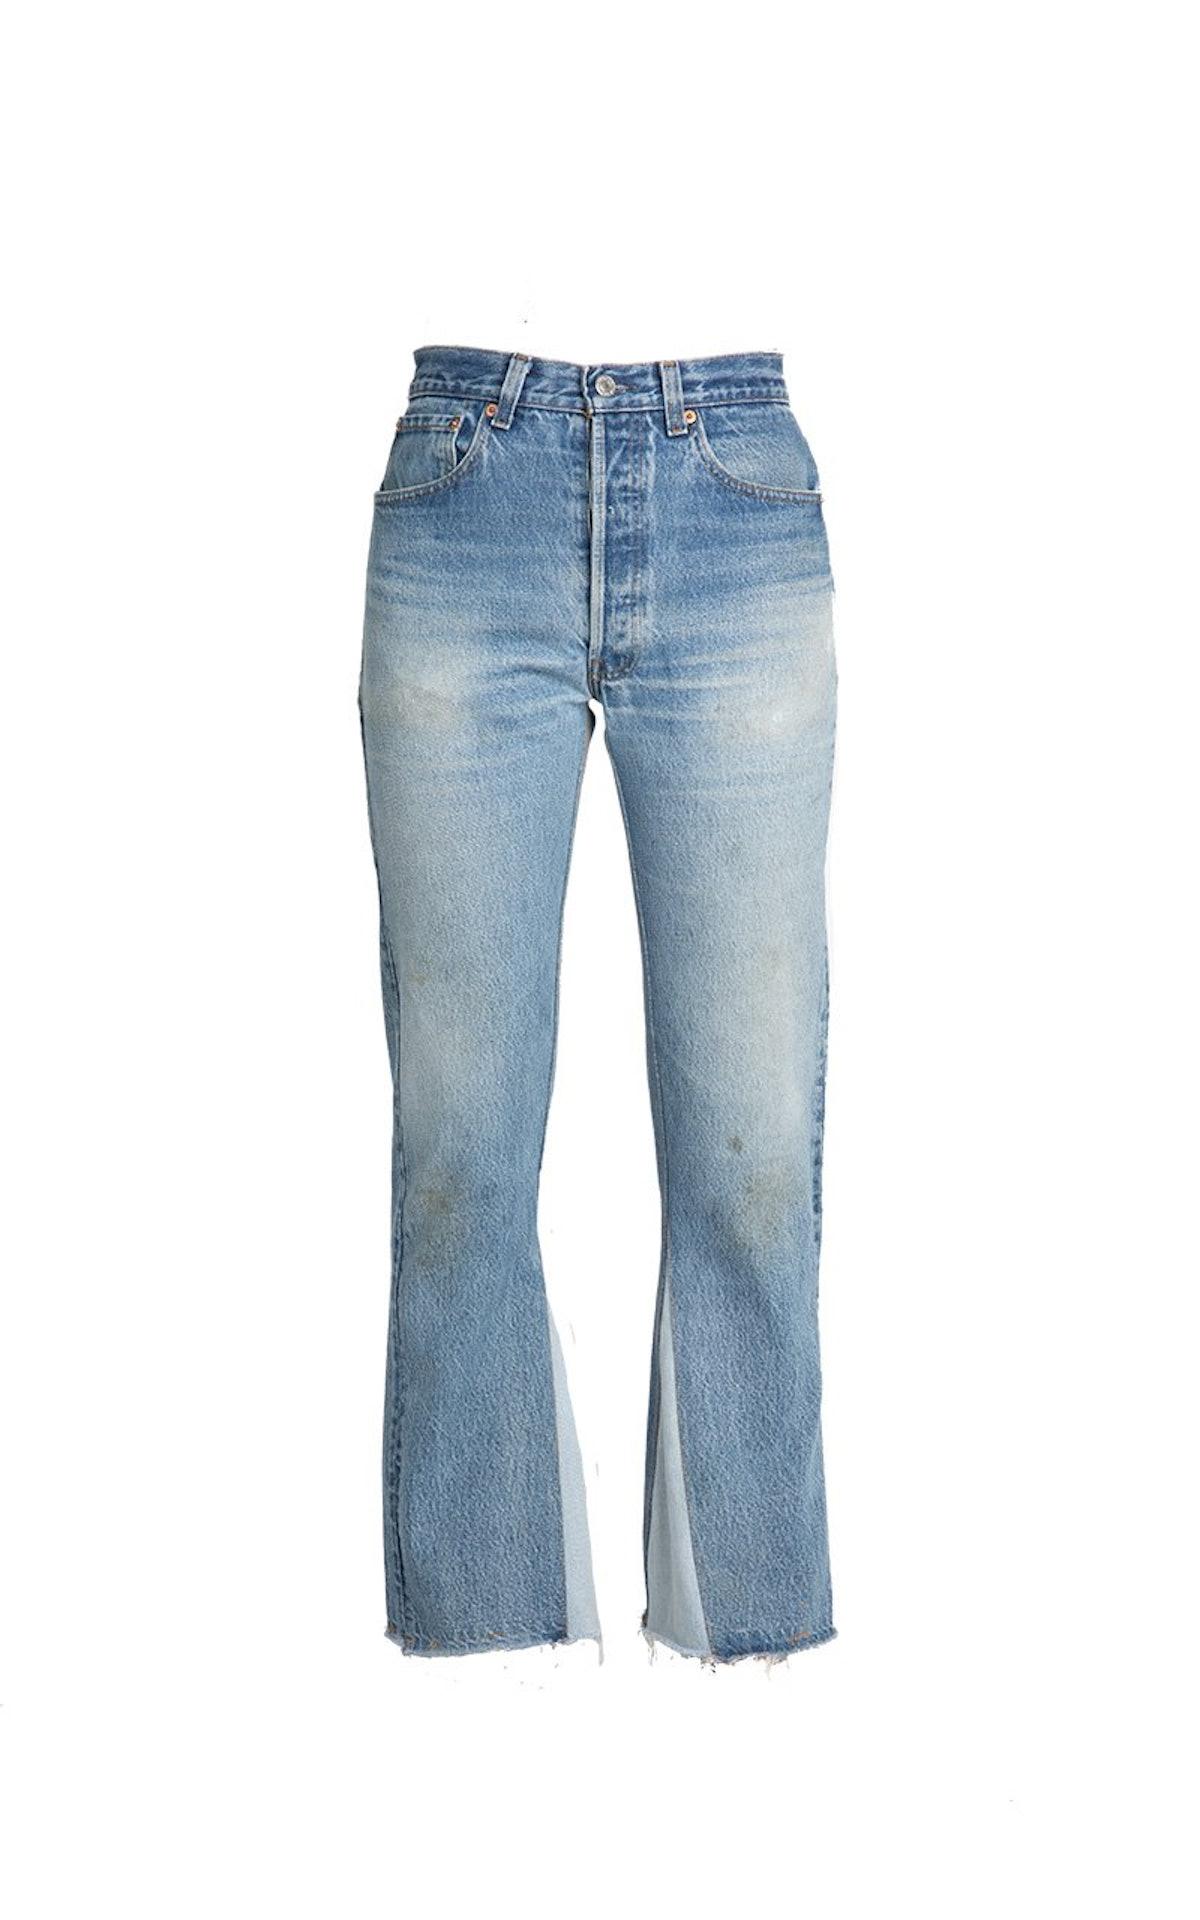 Farrah Flared Jeans from EB Denim.